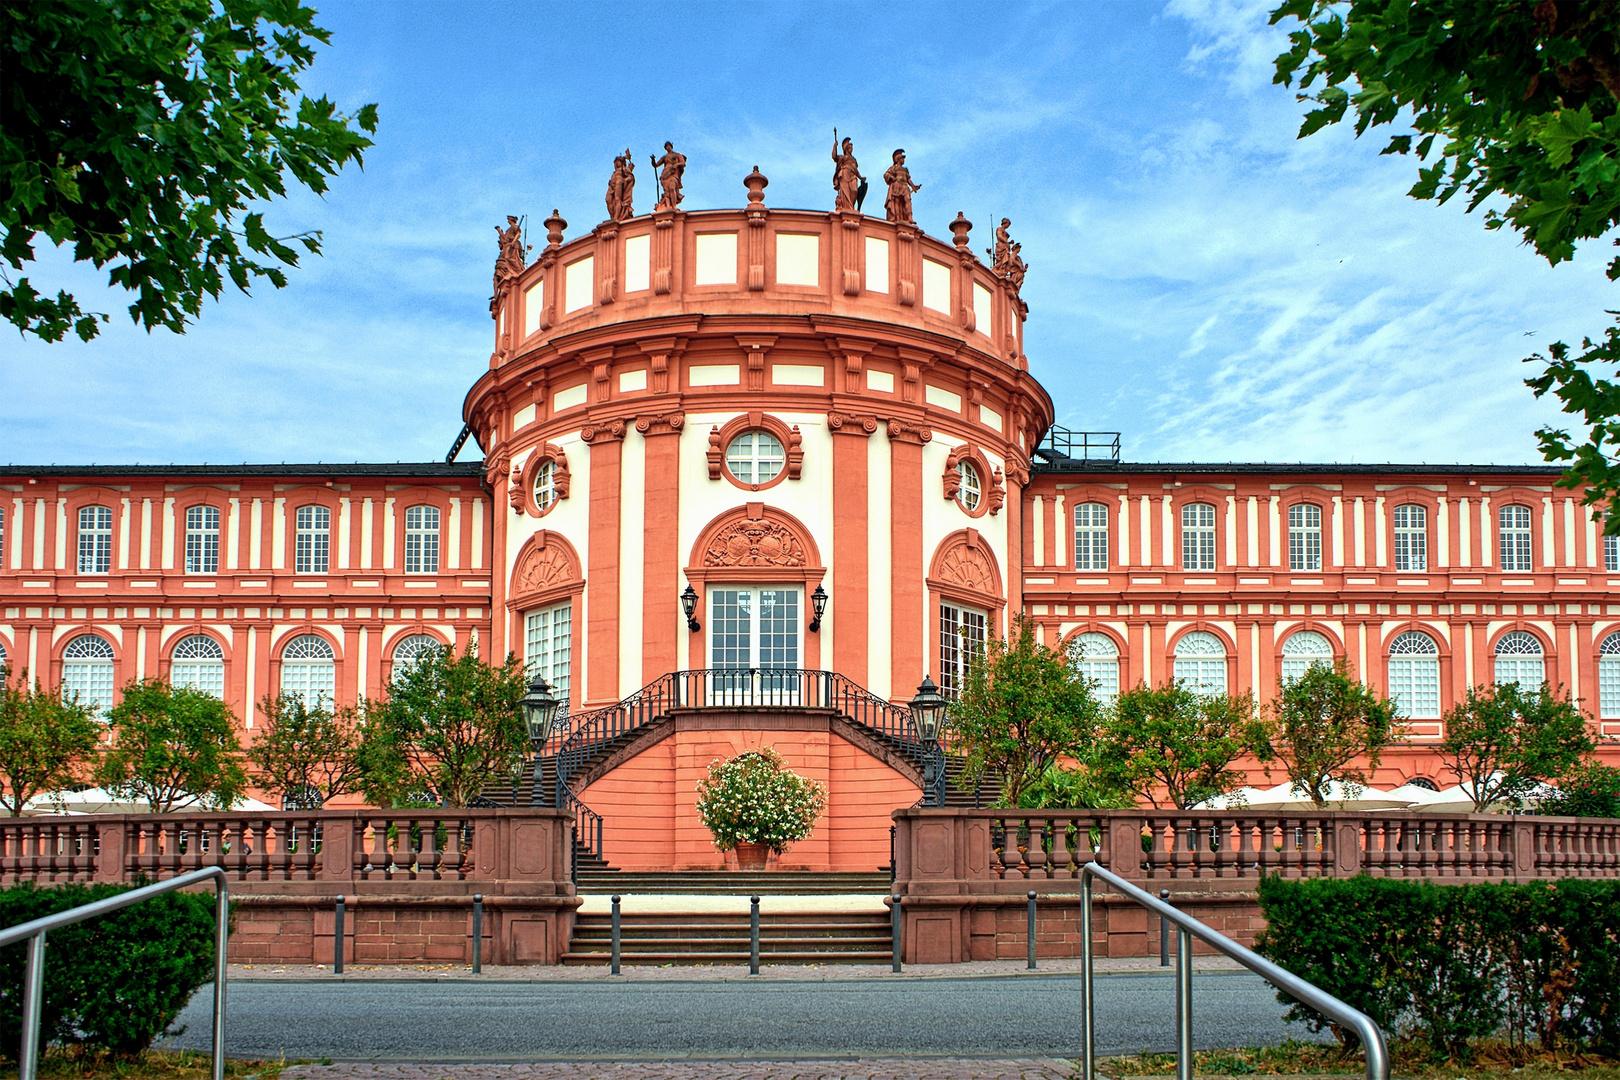 Schloss Biebrich Wiesbaden Foto & Bild